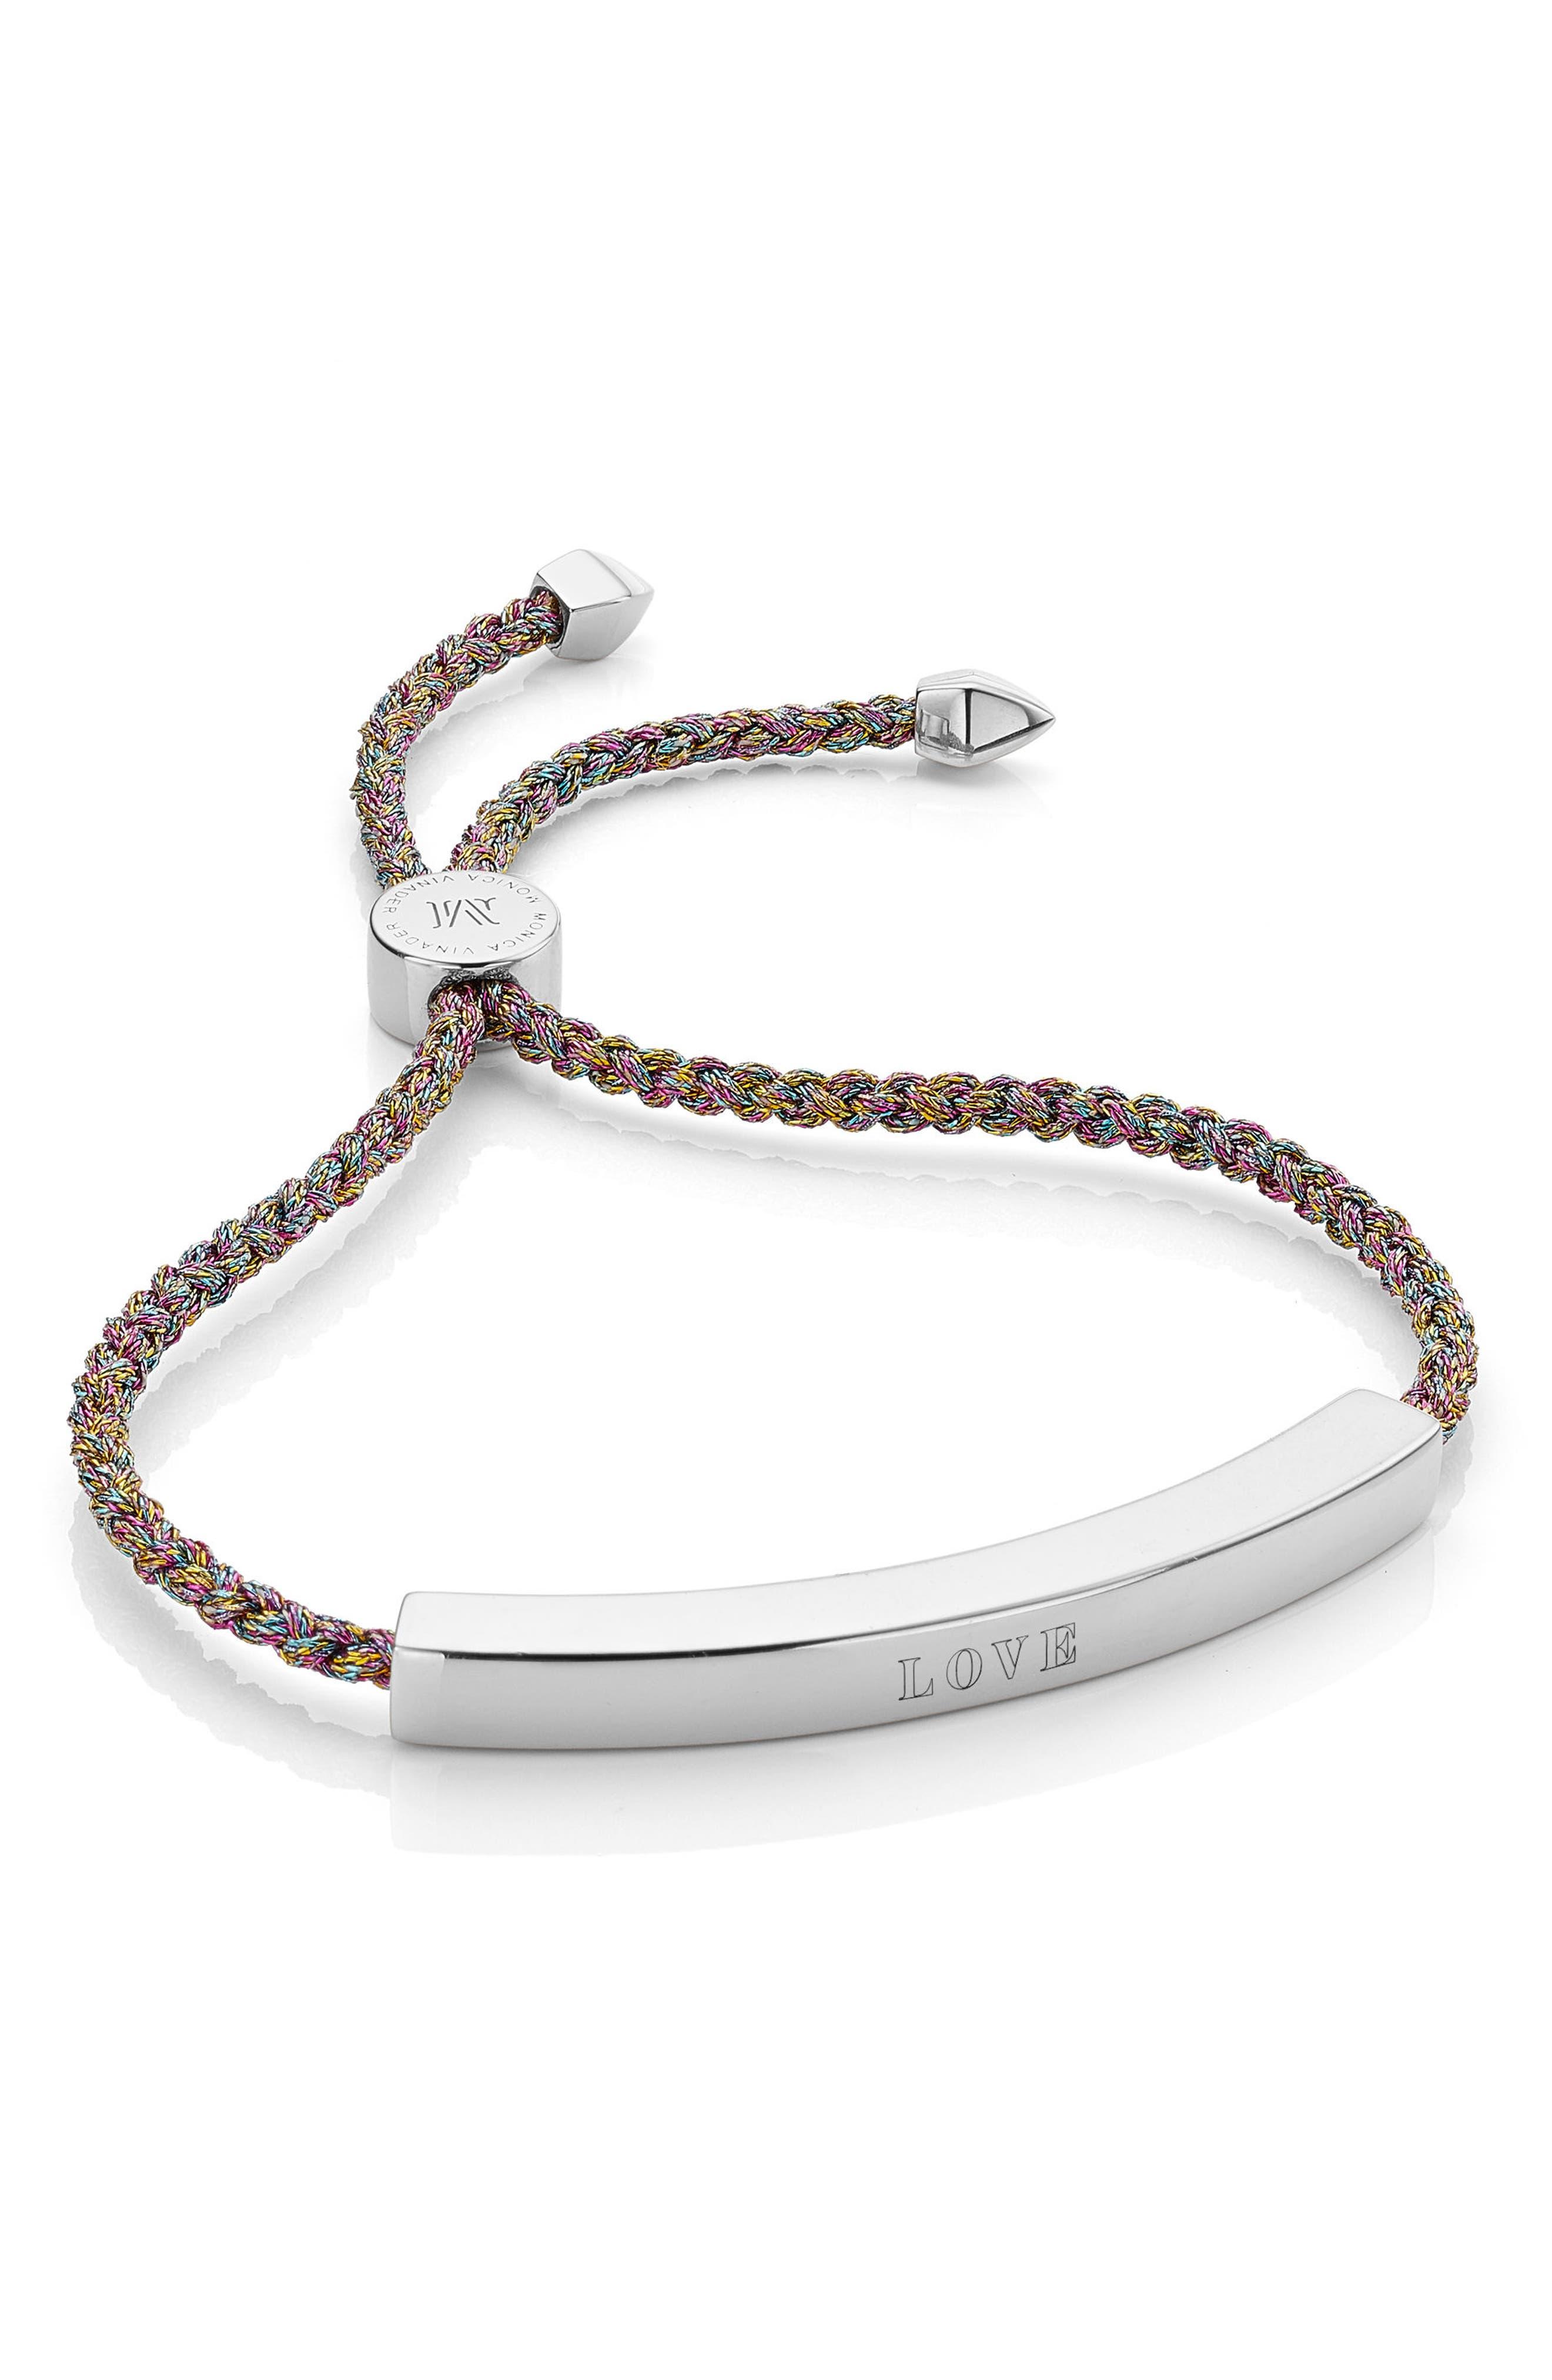 Engravable Large Linear Friendship Bracelet,                             Alternate thumbnail 2, color,                             RAINBOW METALLIC/ SILVER